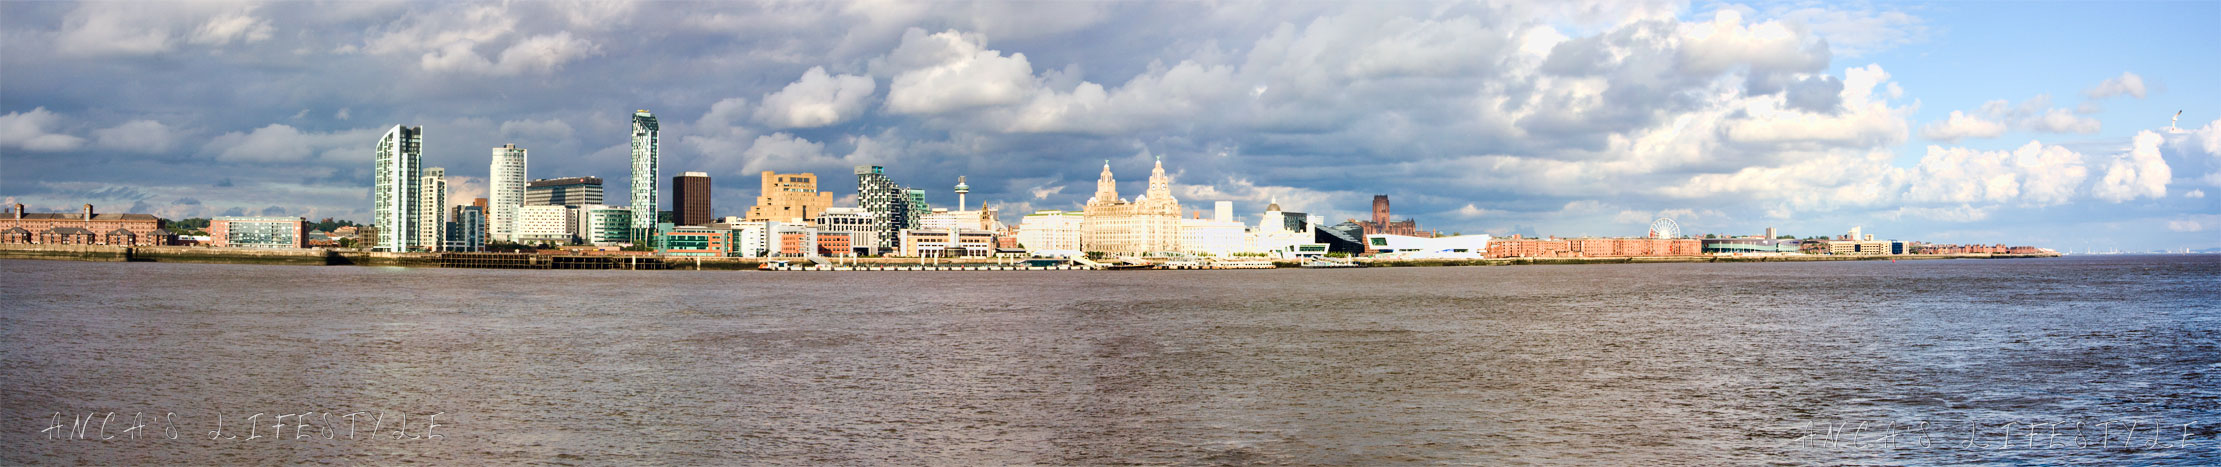 liverpool_panorama